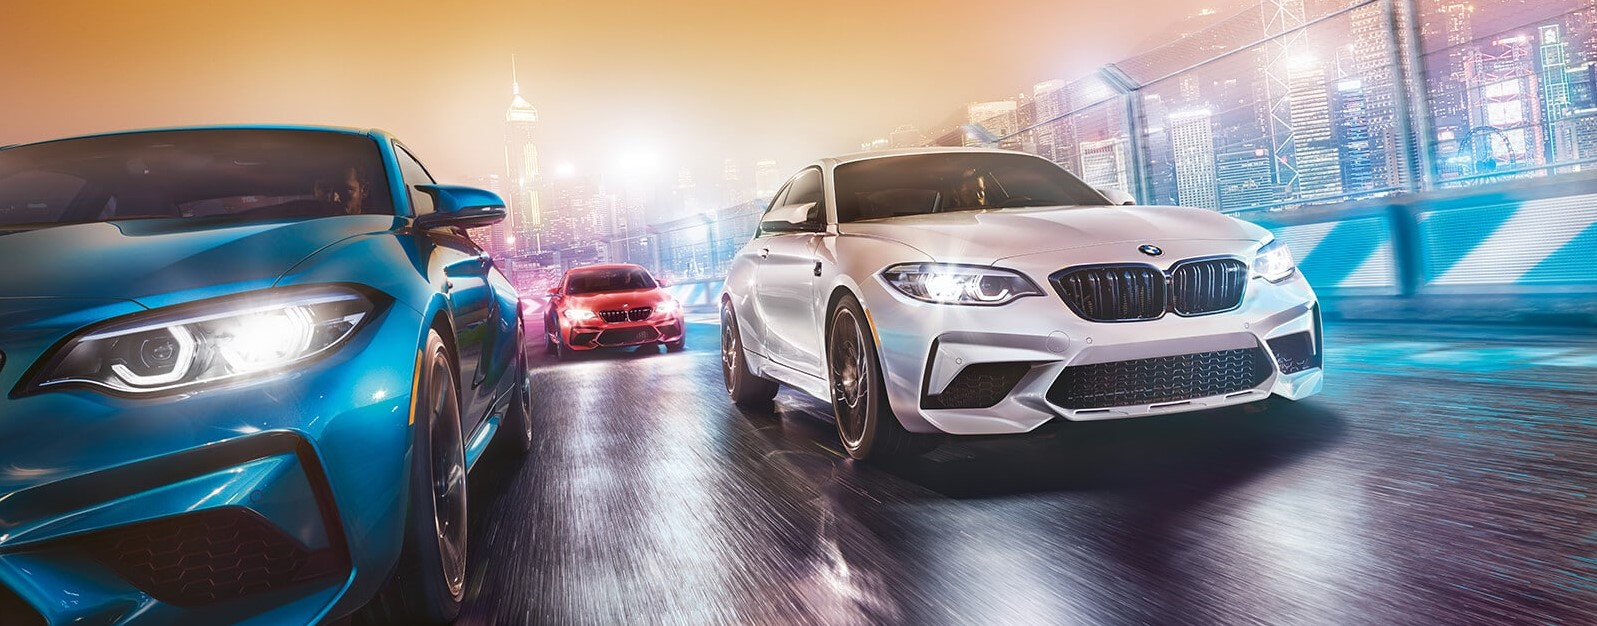 2019 BMW M line vs 2019 Audi S line